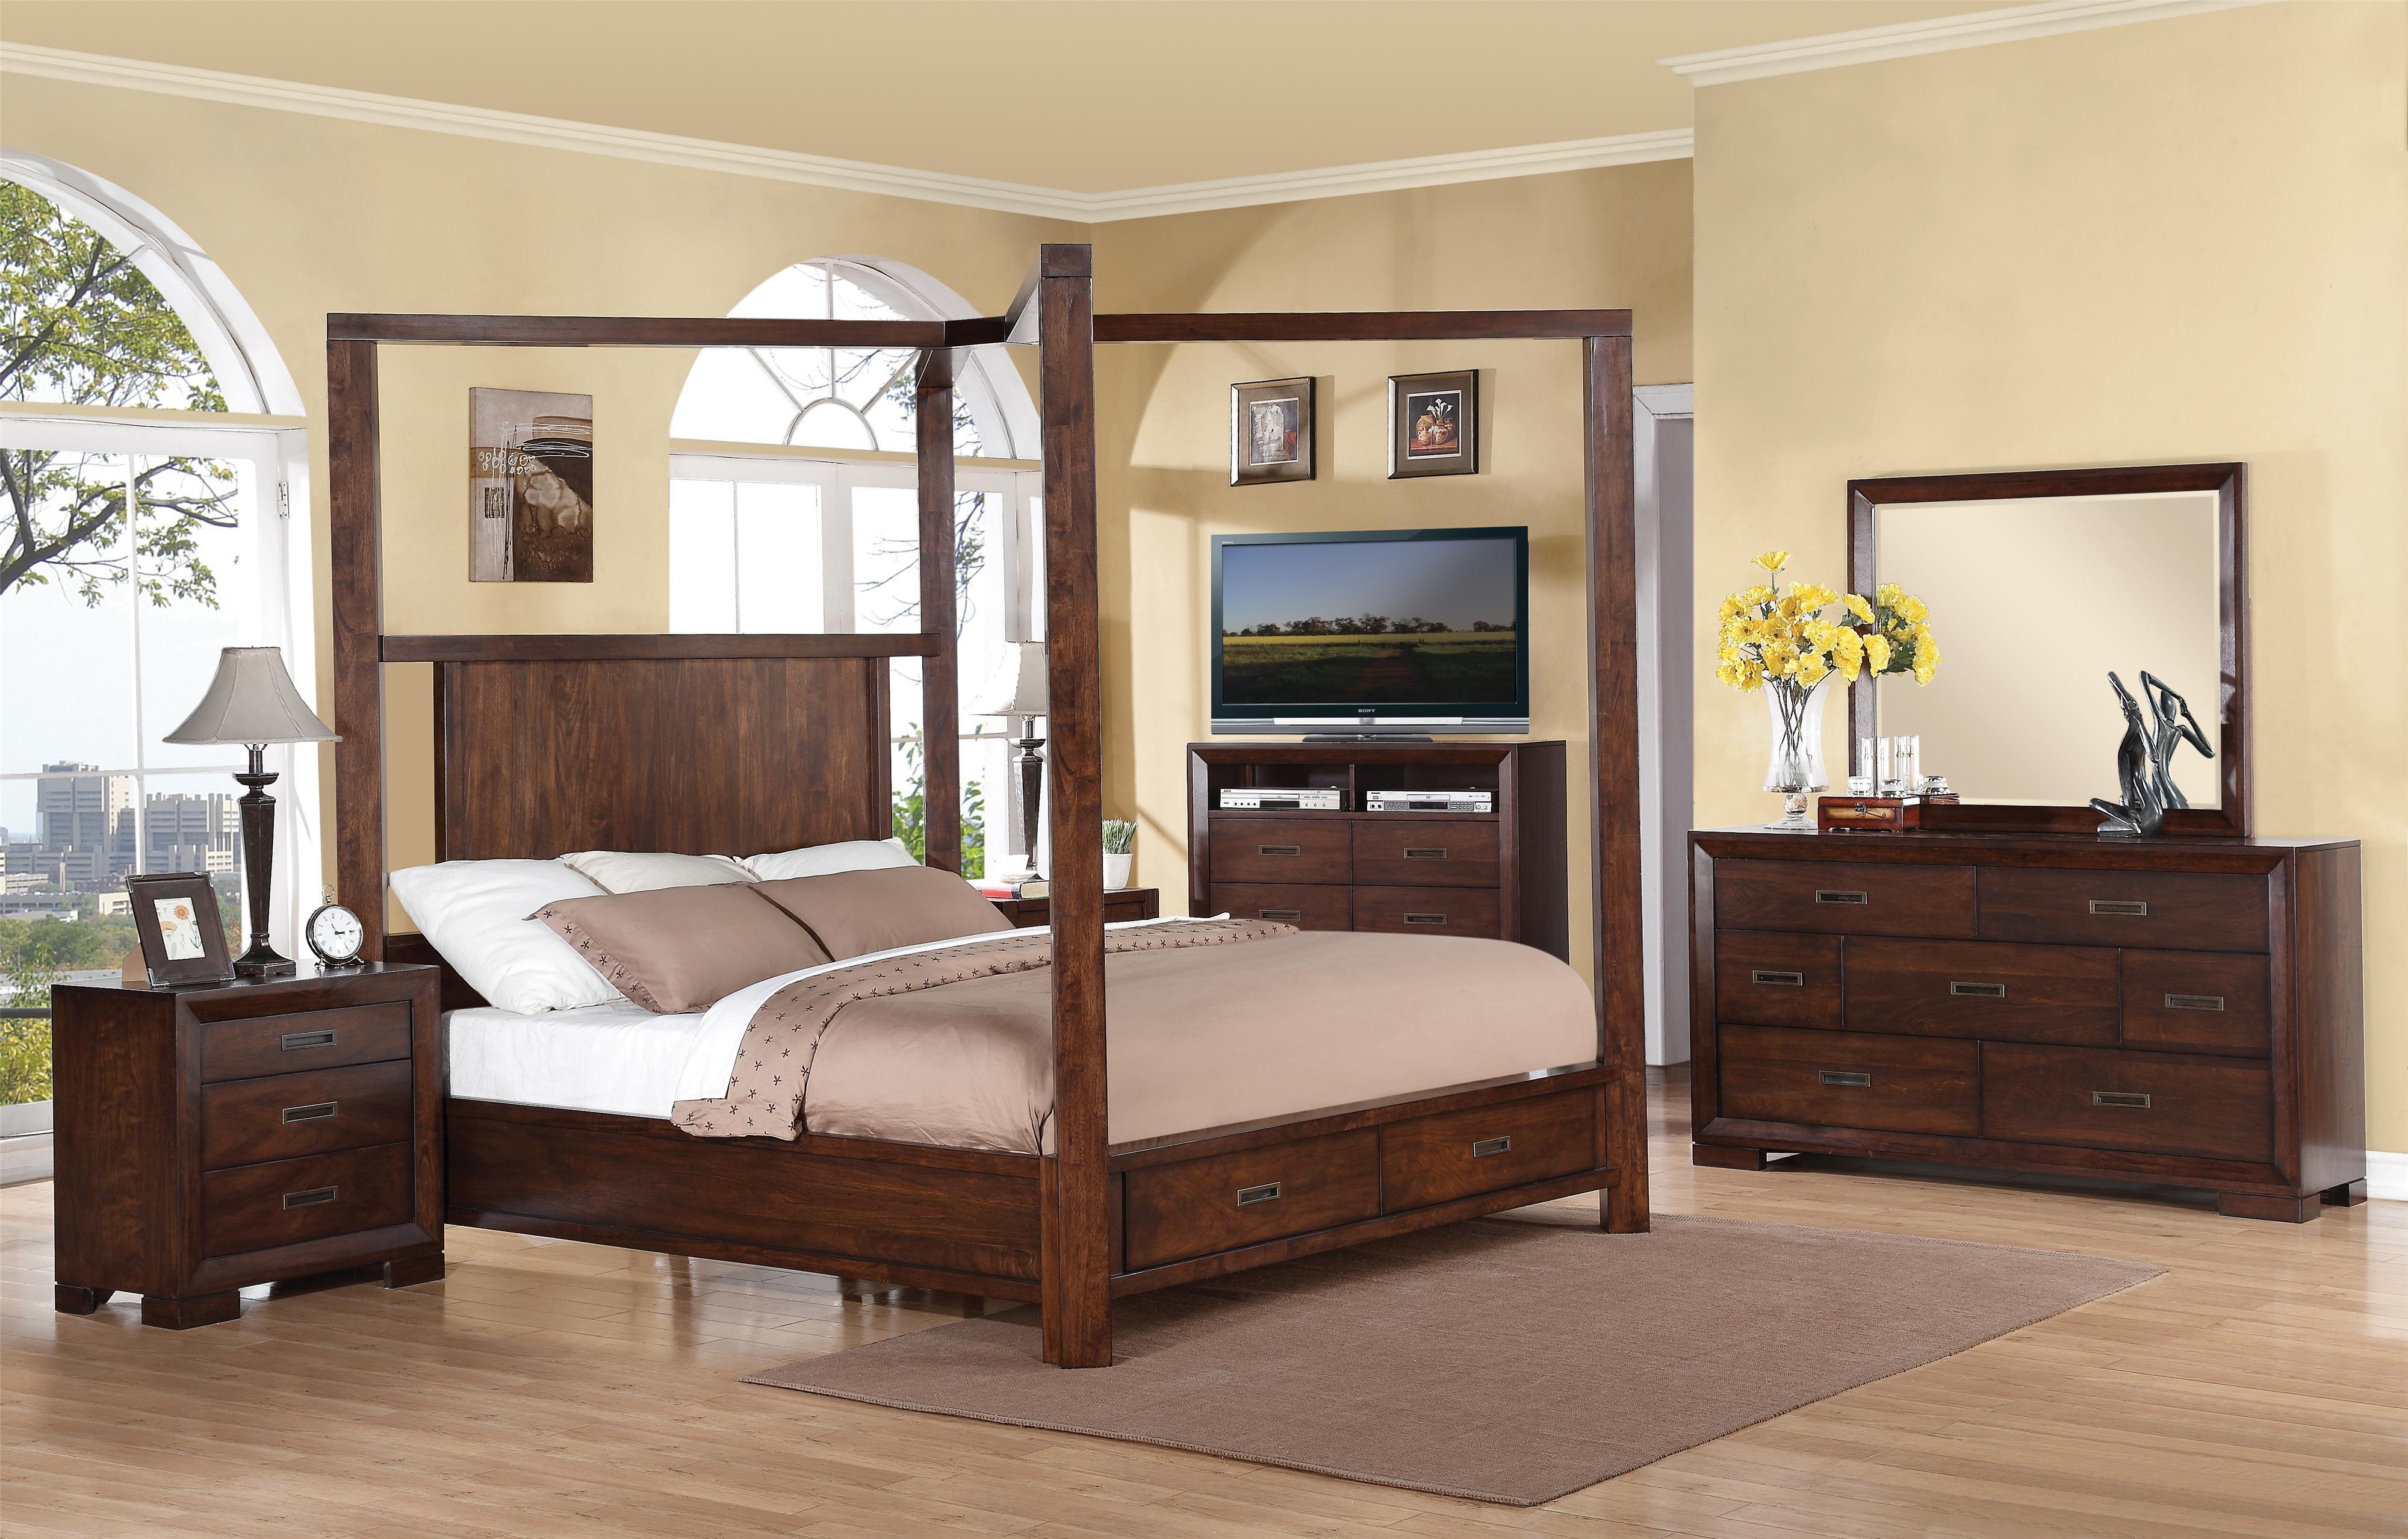 Riverside Furniture Riata Queen Canopy Storage Bed Value